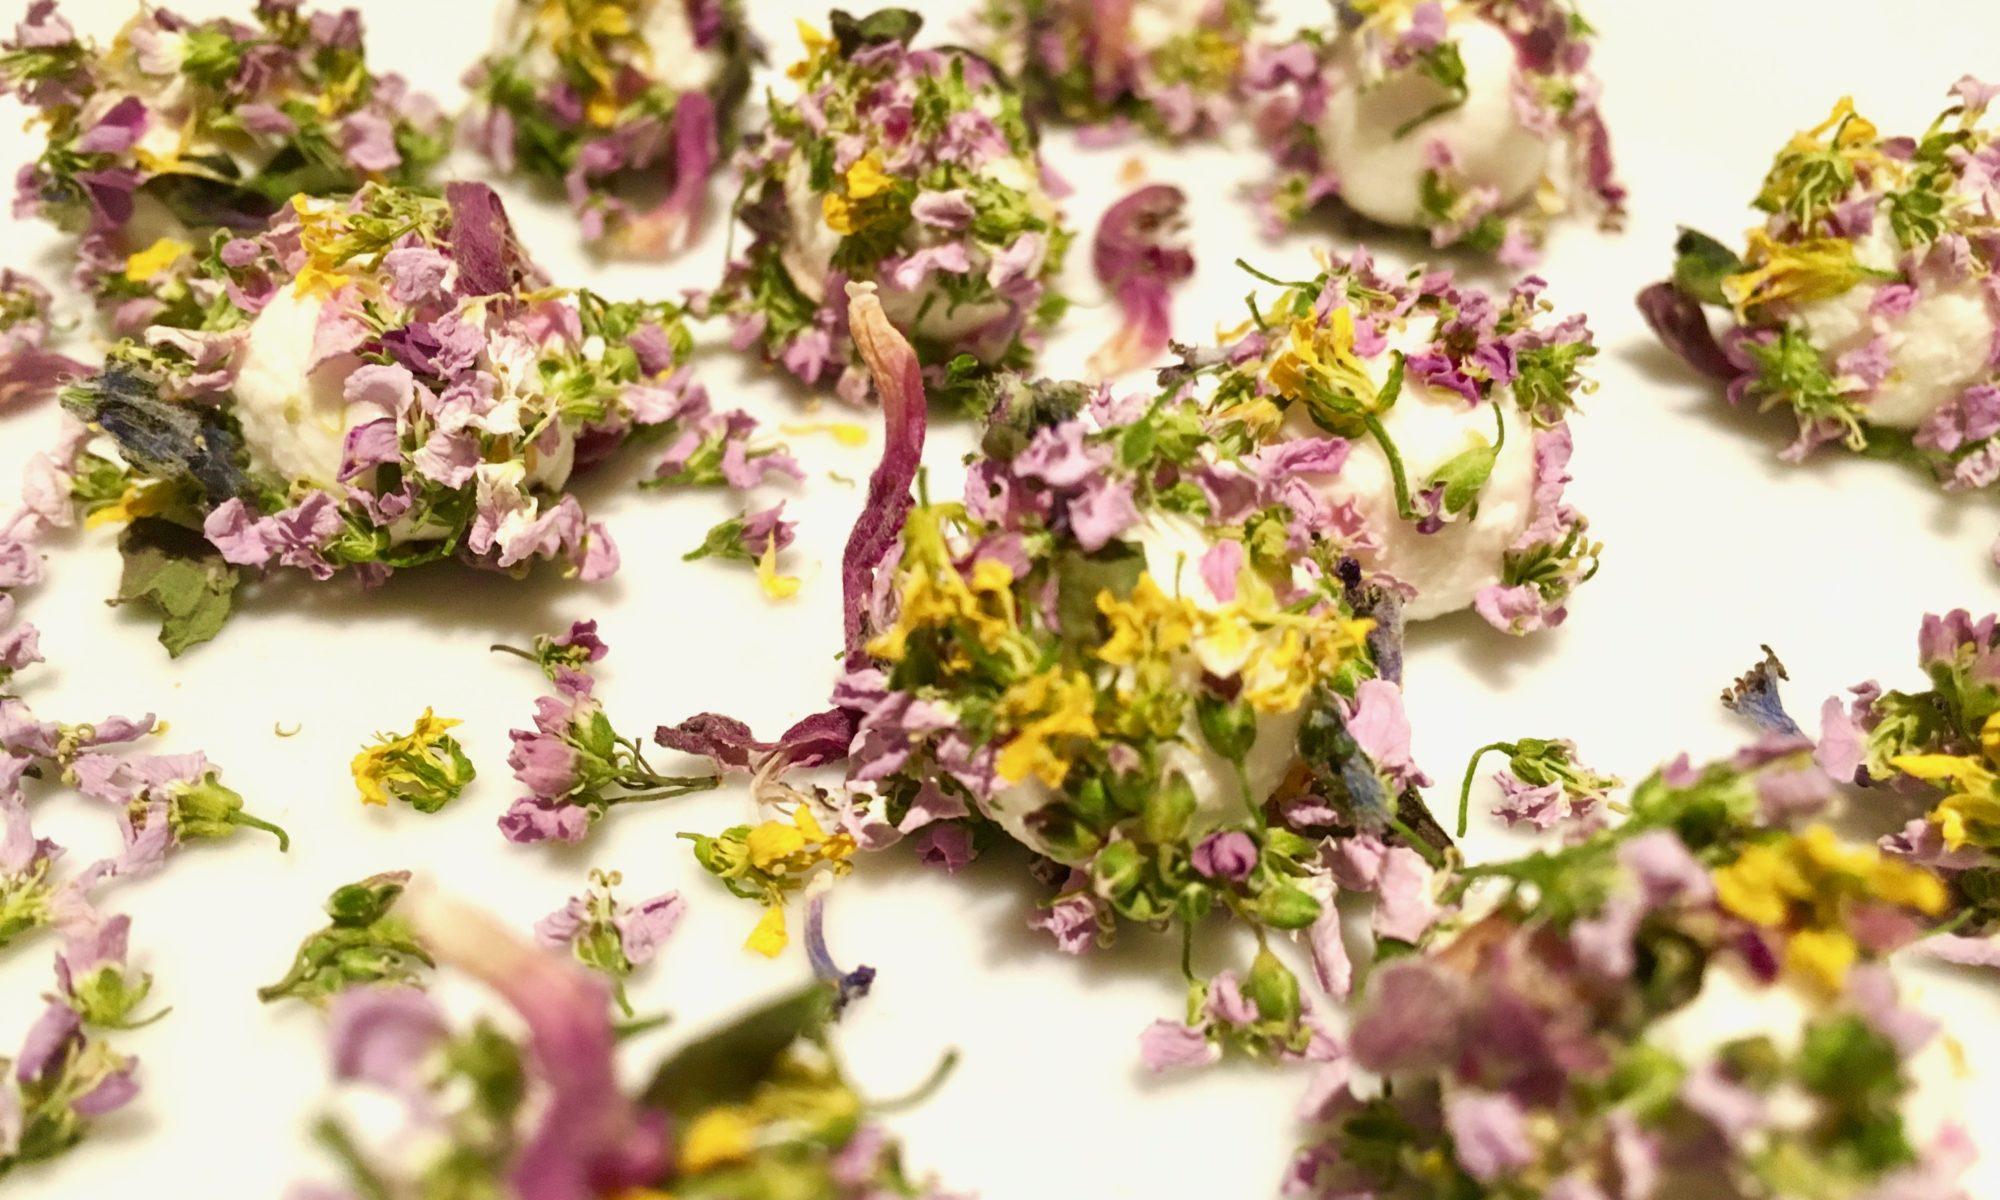 Frischkäsebällchen mit Blüten